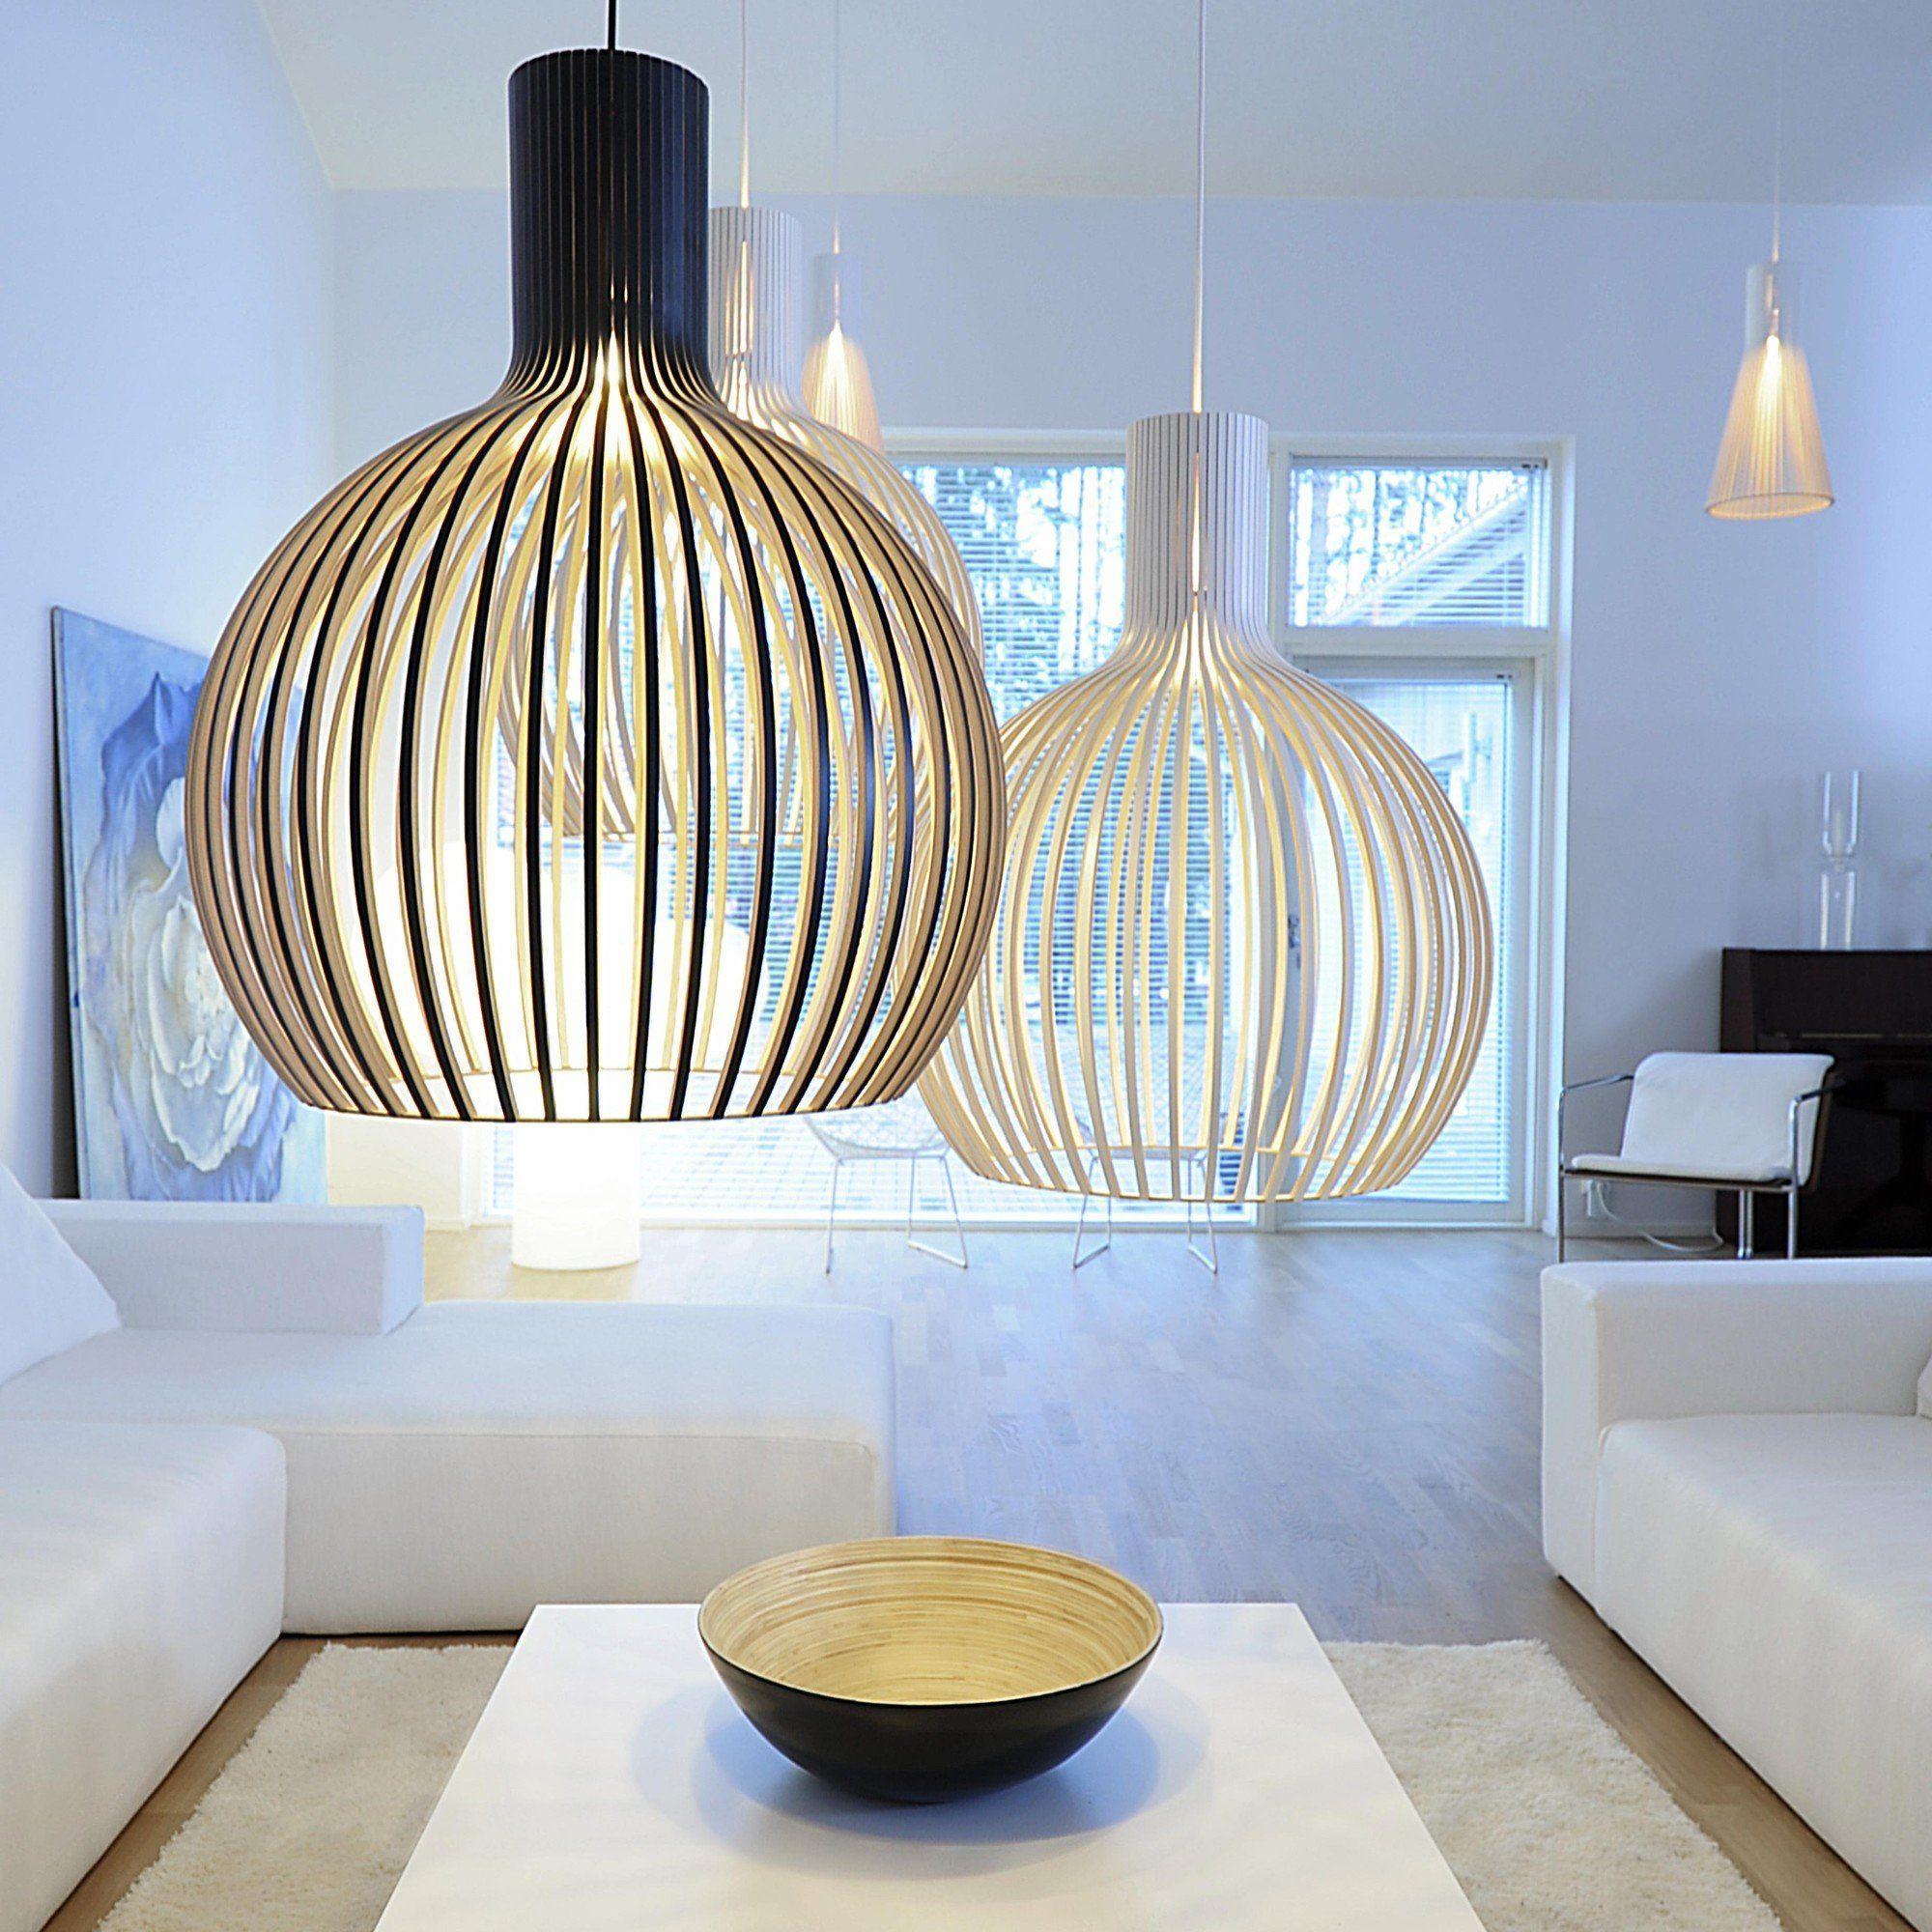 Secto Design Octo 4240 Suspension Lamp Scandinavian Pendant Lighting Lamps Living Room Lamp Design